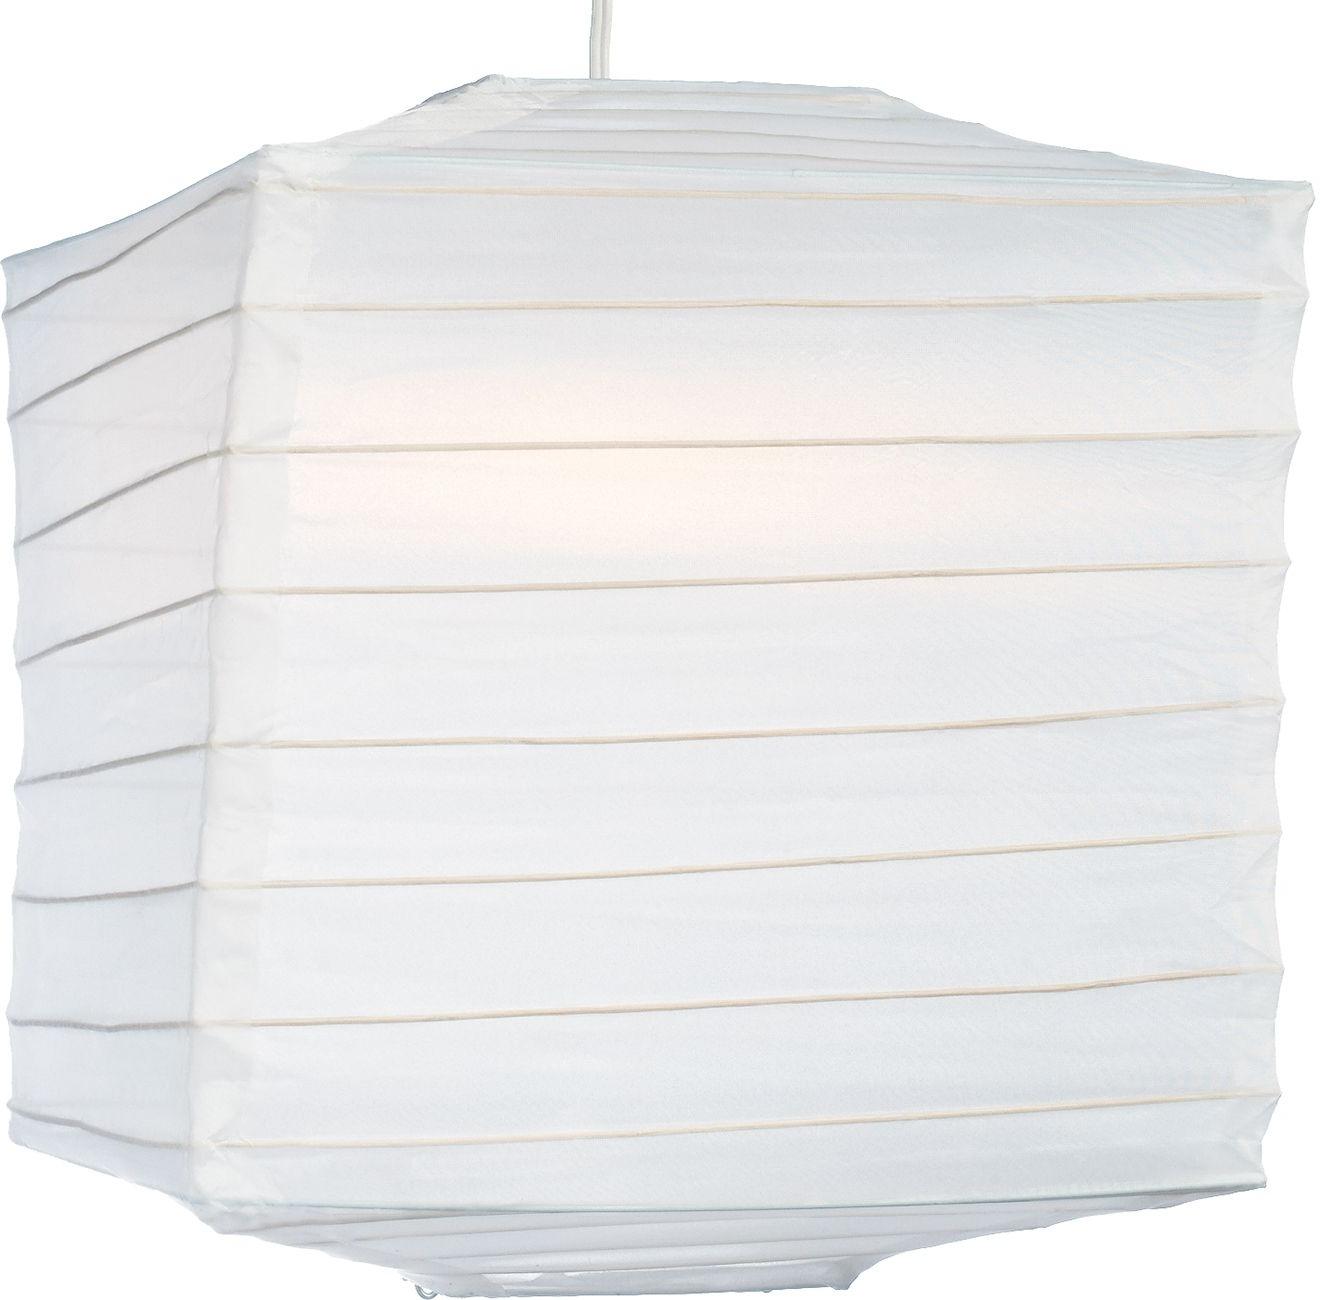 Newest White 10 Inch Square Outdoor Nylon Lantern – Luna Bazaar Pertaining To Outdoor Nylon Lanterns (Gallery 18 of 20)